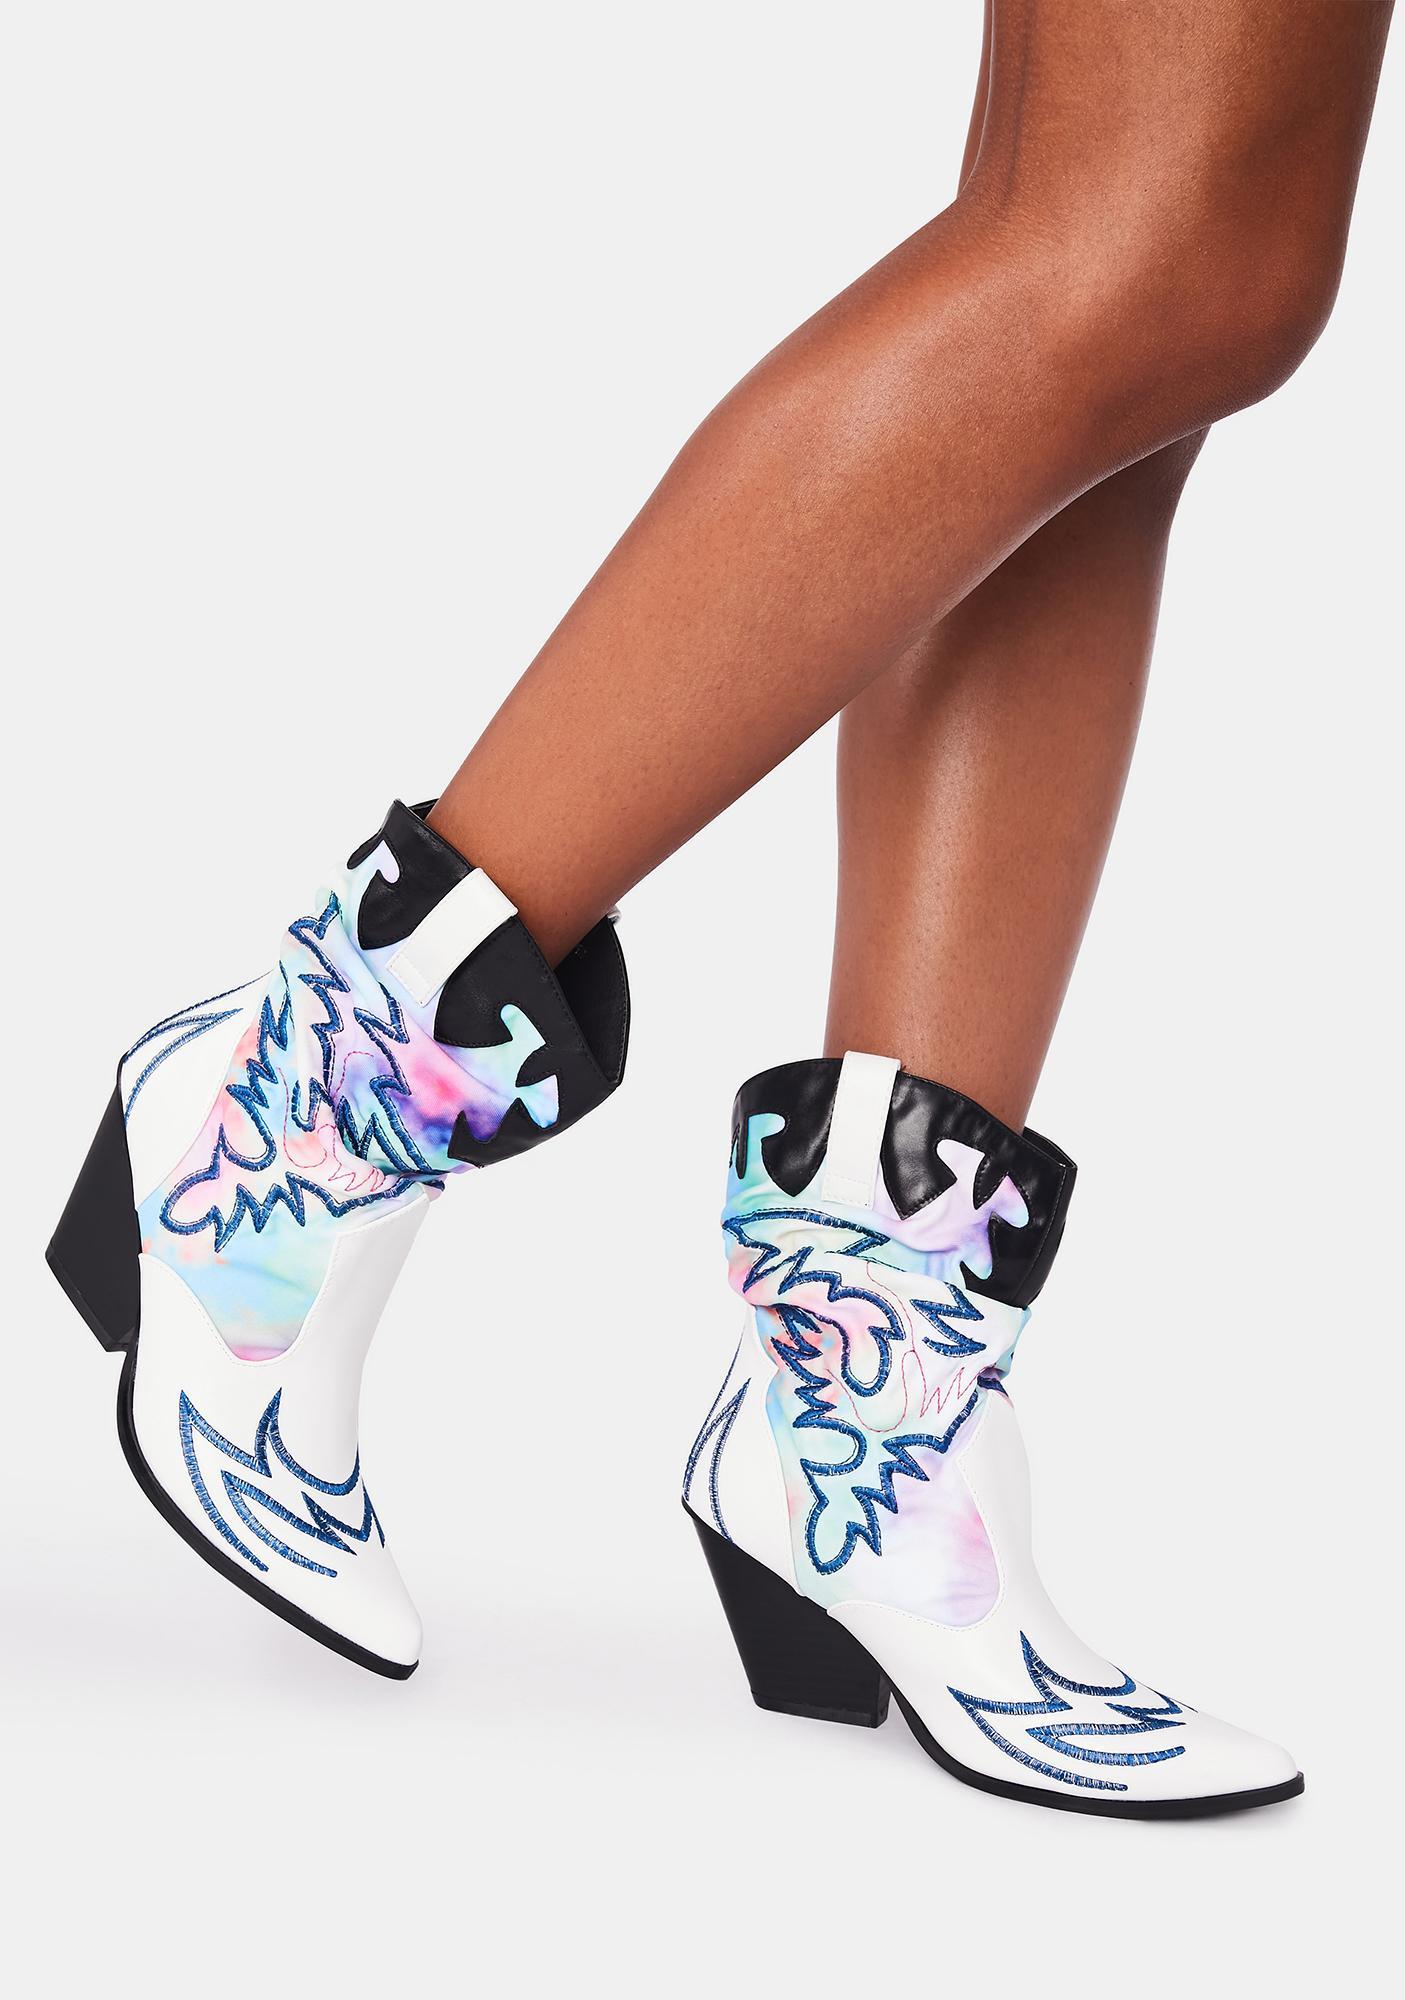 Midnight Cowboy Boots